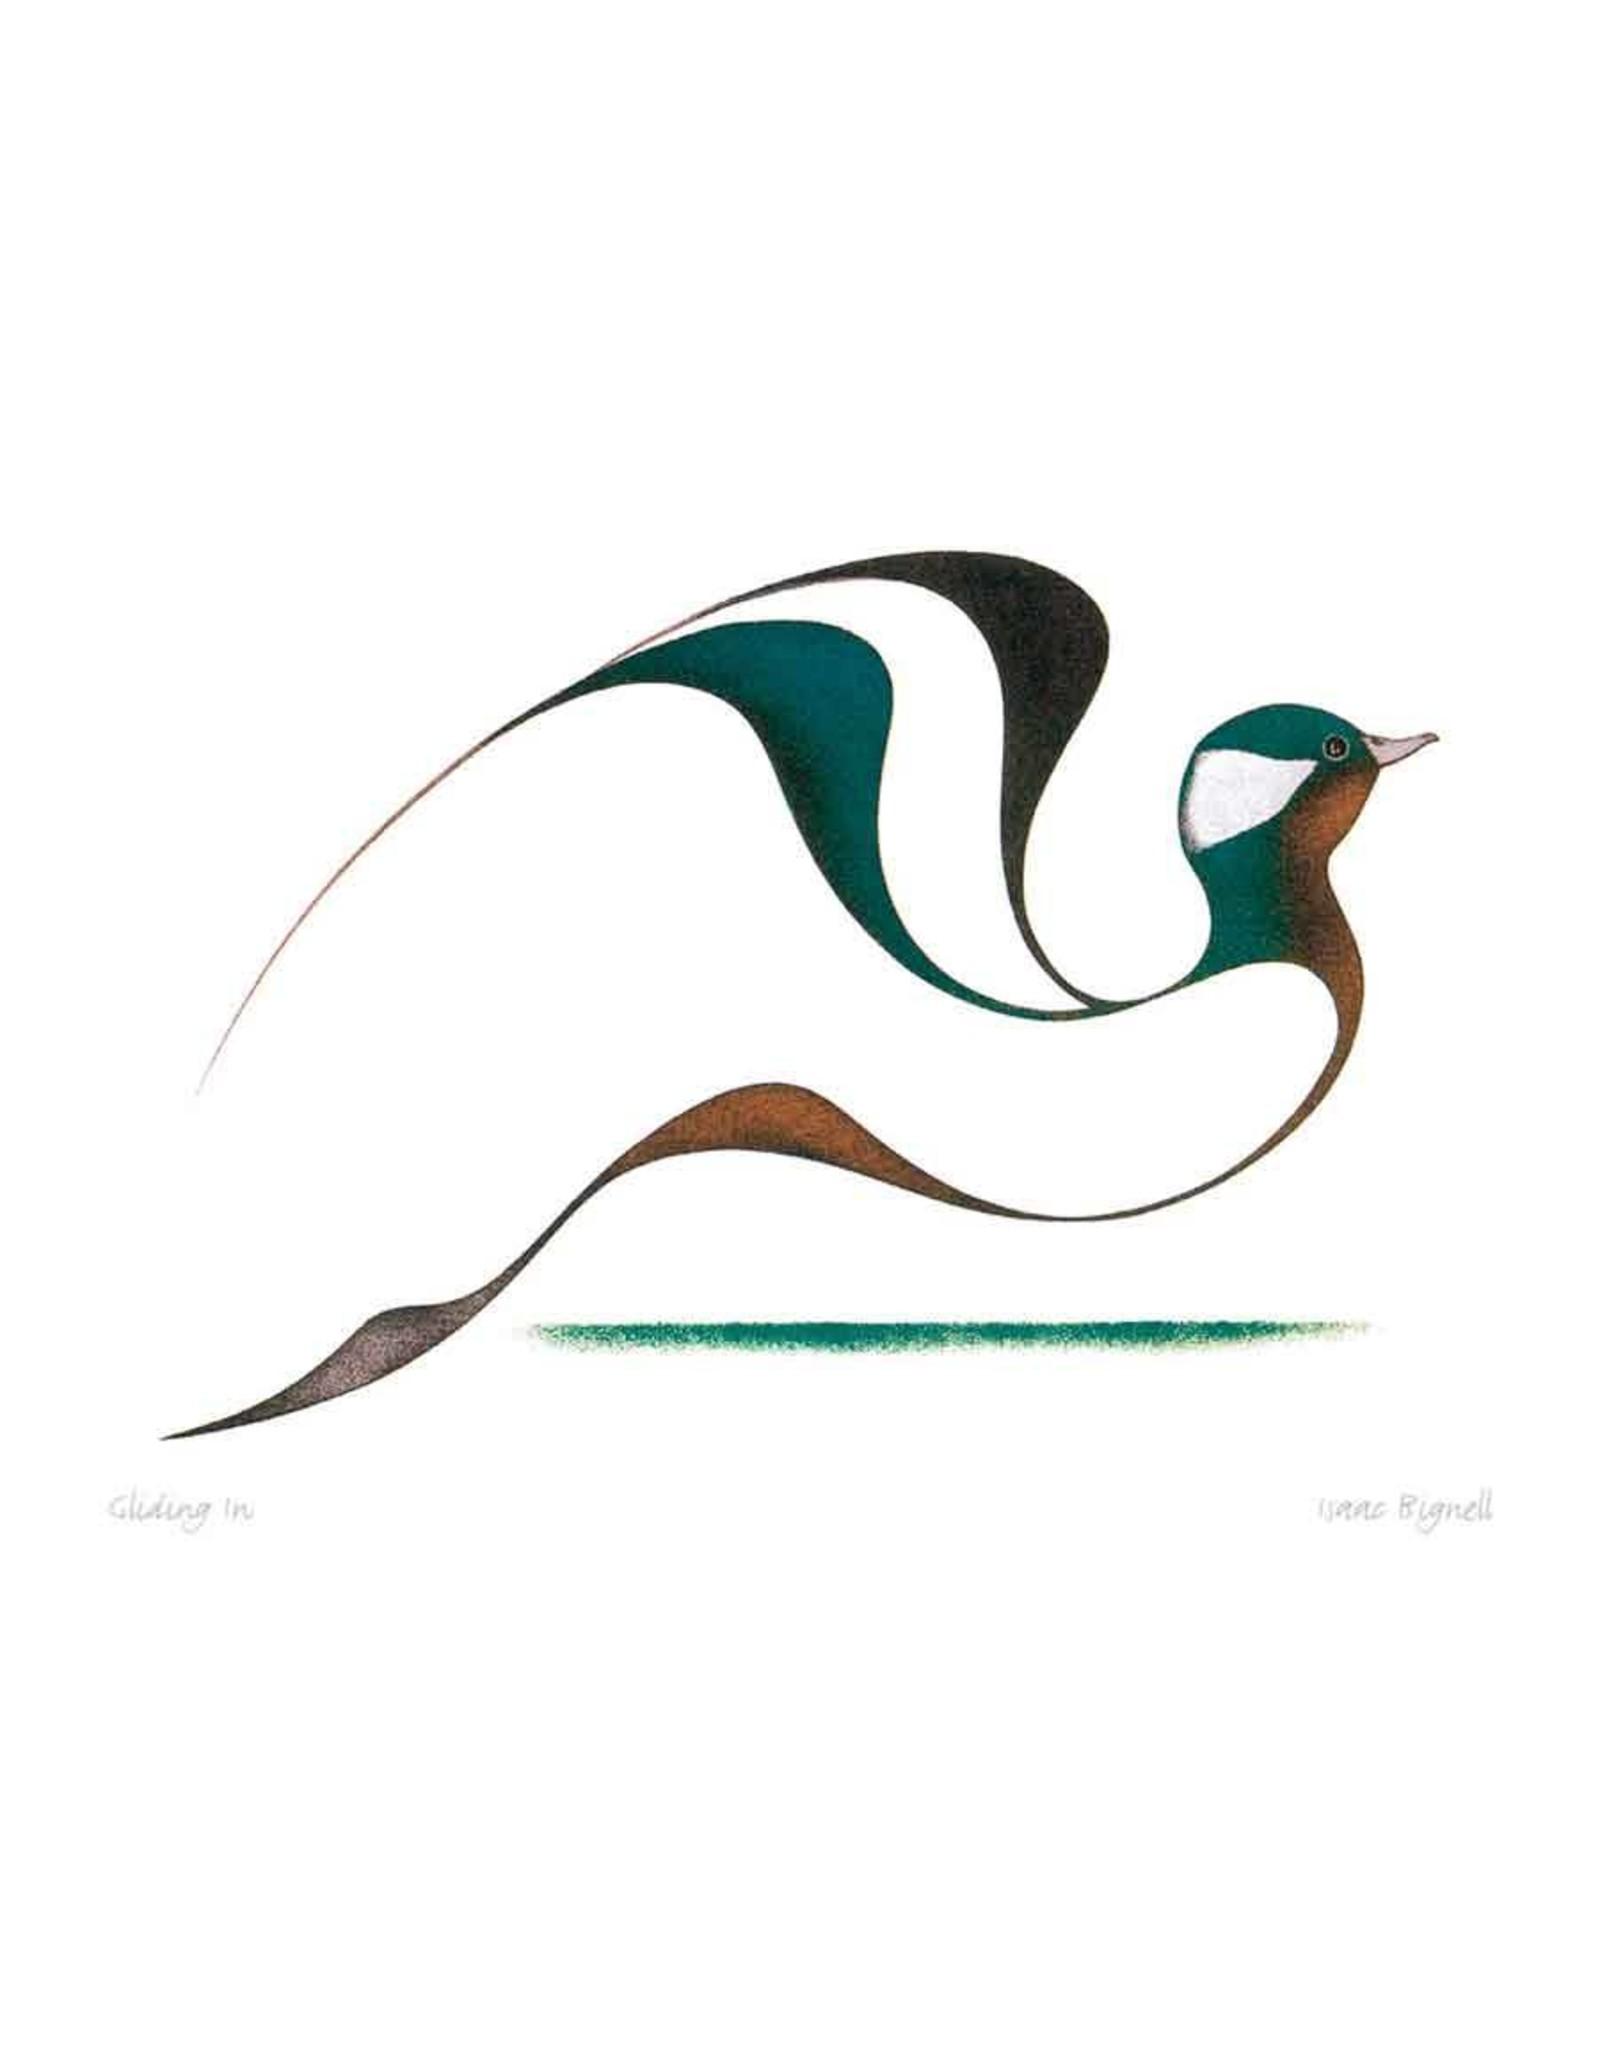 Gliding In par Isaac Bignell Carte